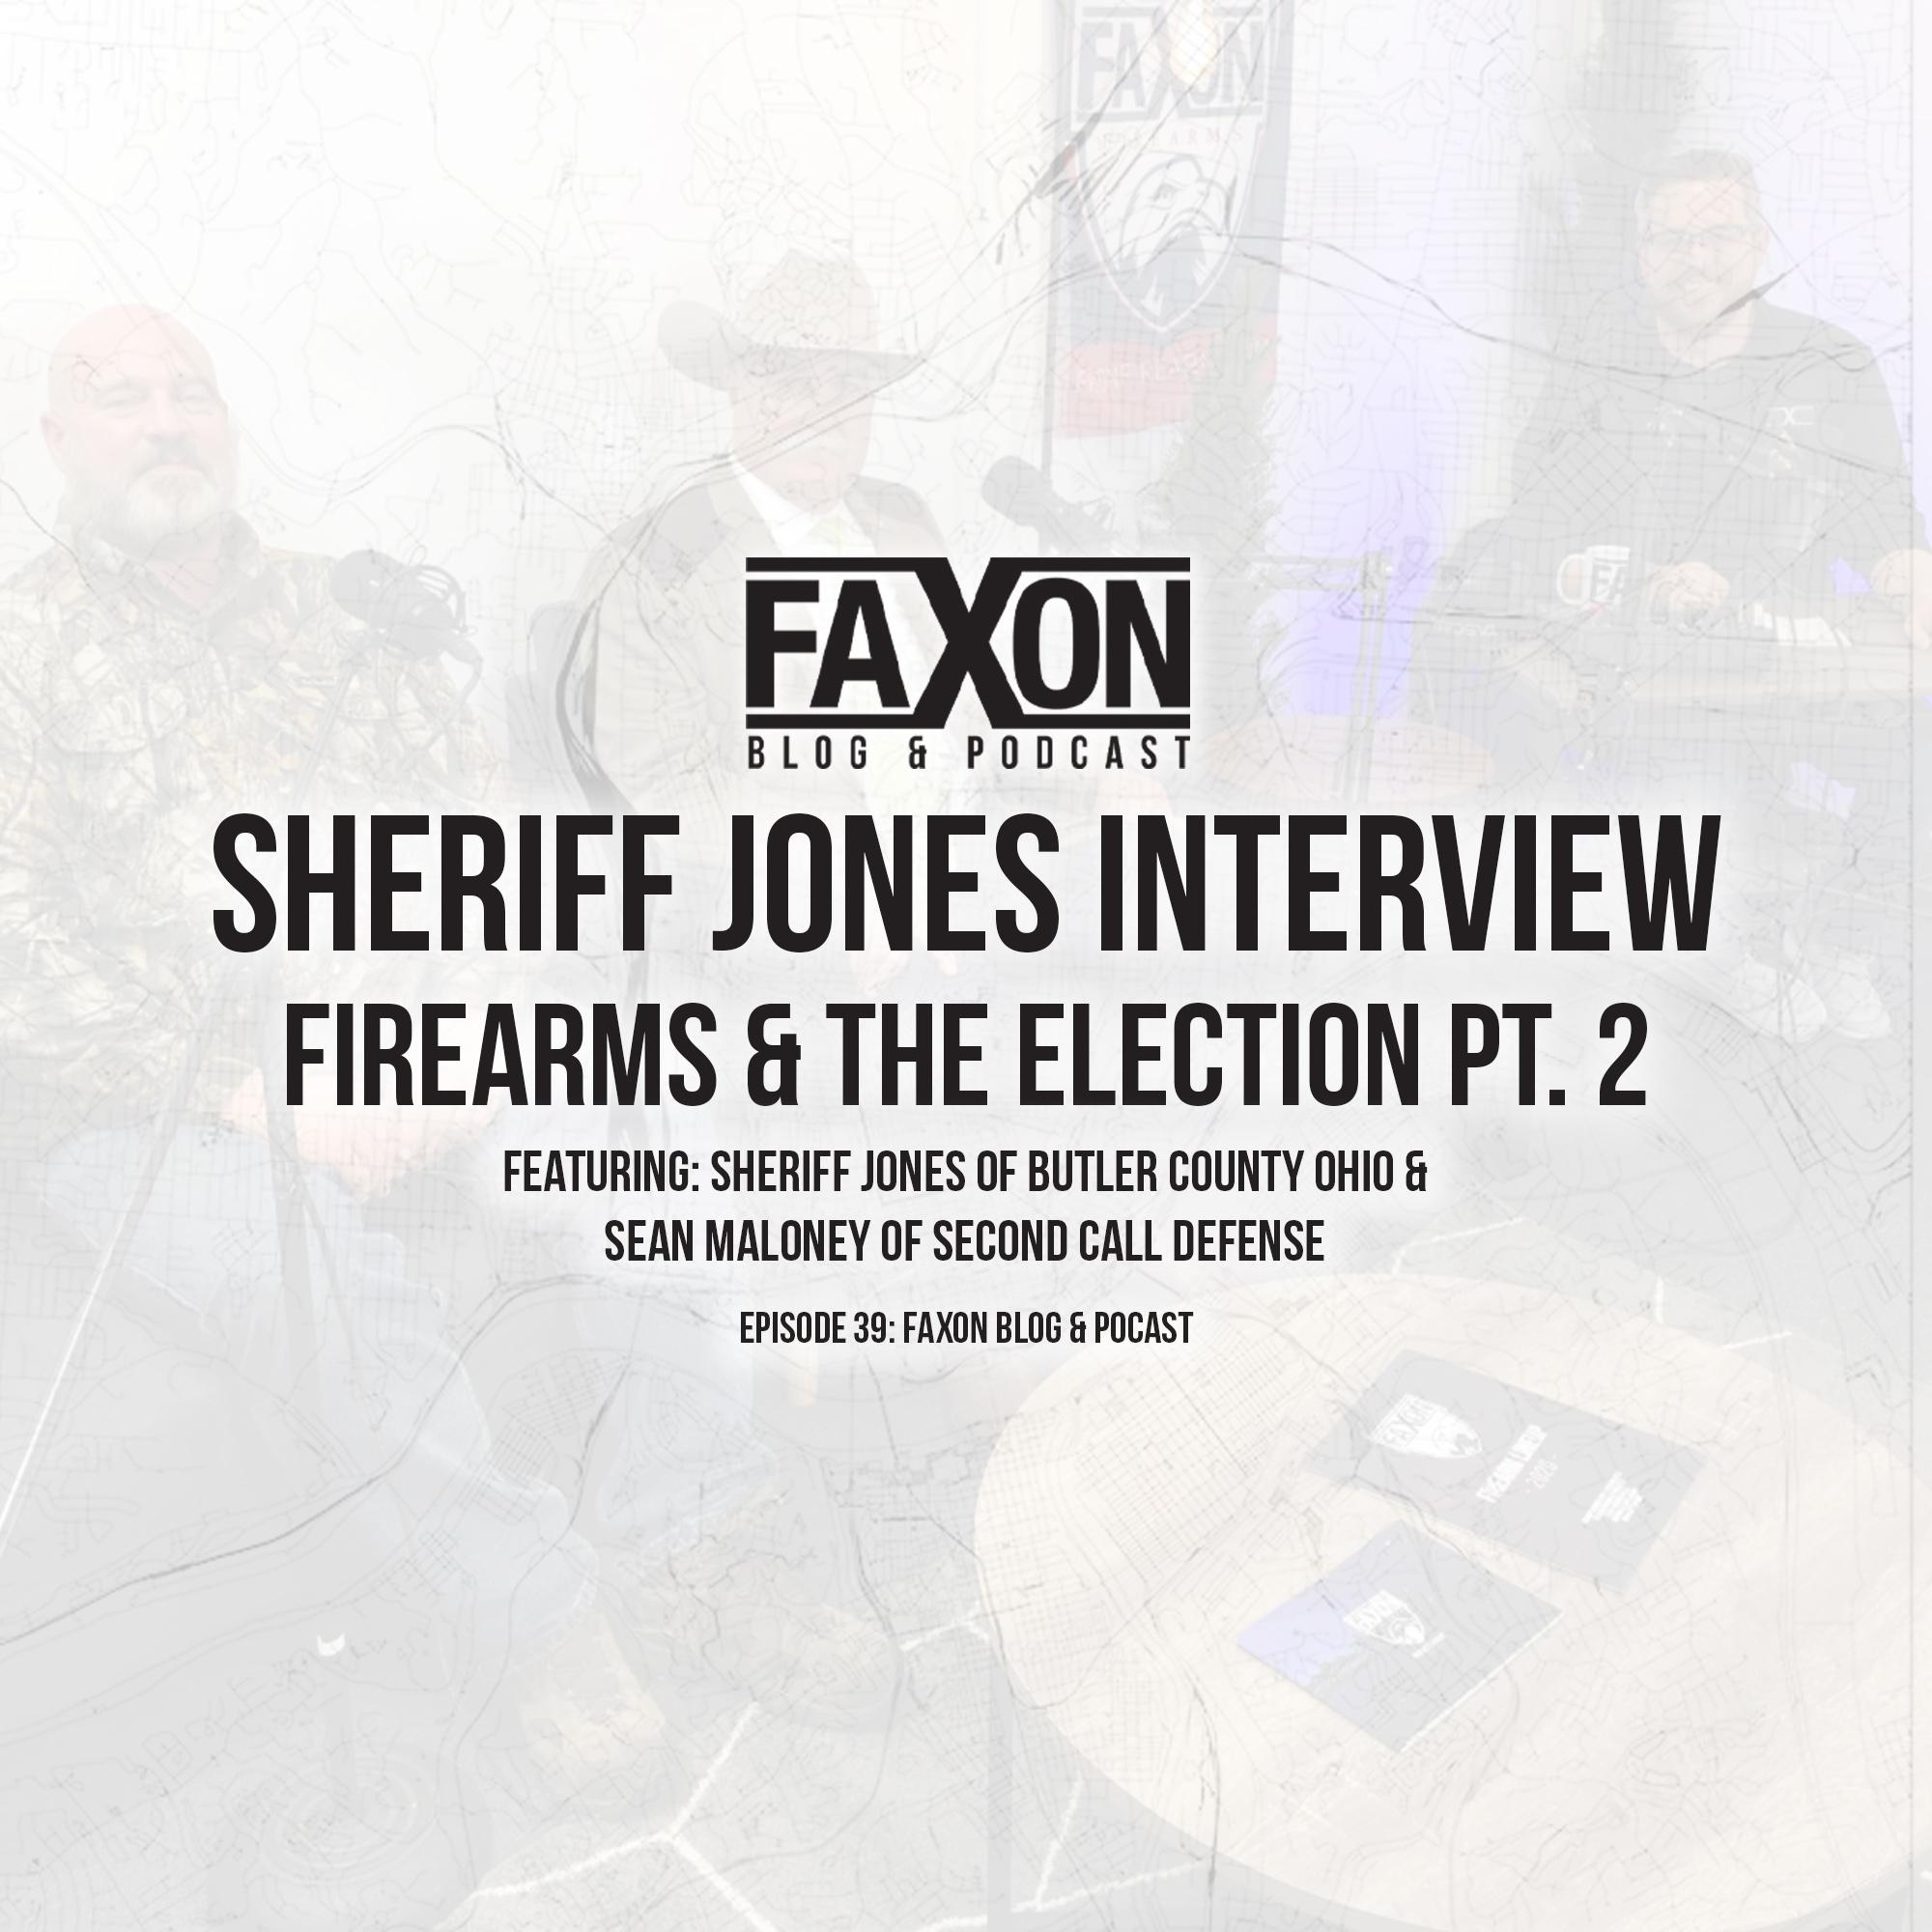 Sheriff Jones Interview | Episode 39: Faxon Blog & Podcast